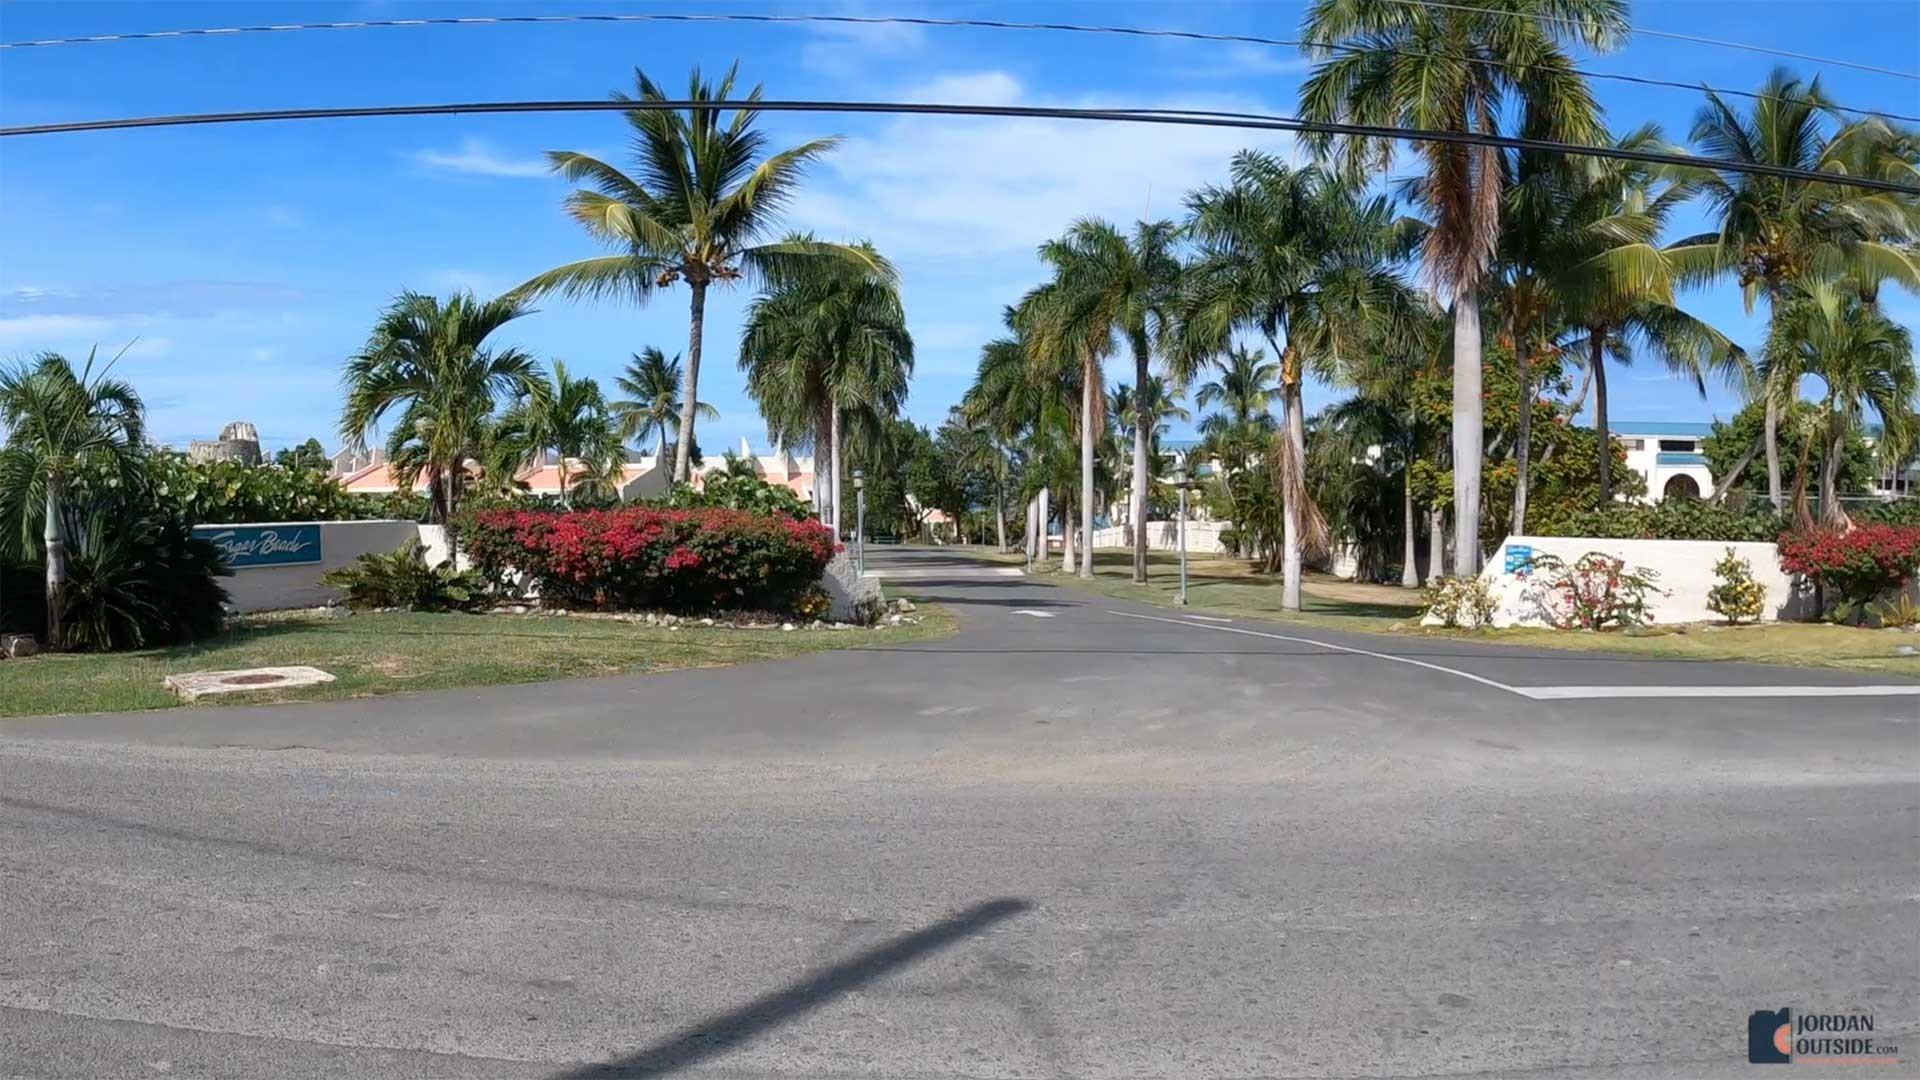 Sugar Beach Condos Entrance